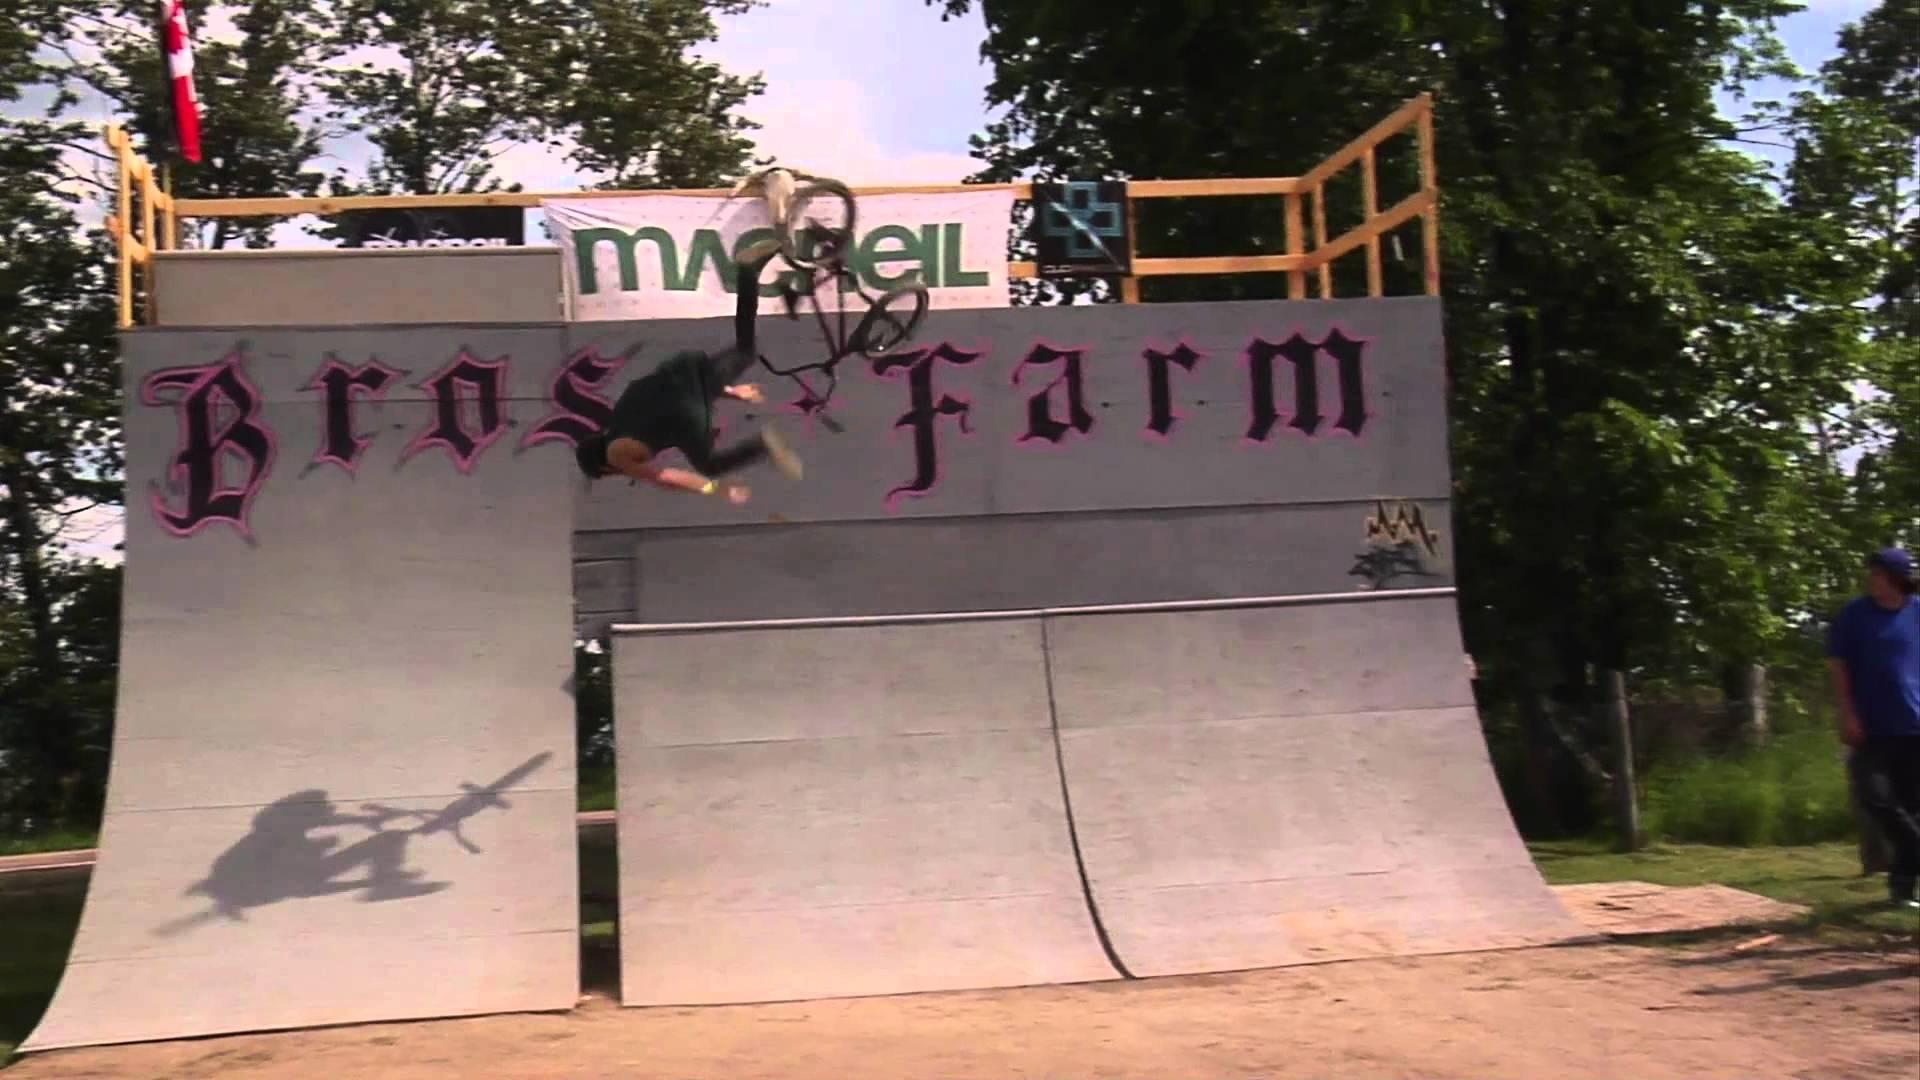 Brose Farm Jam 2012